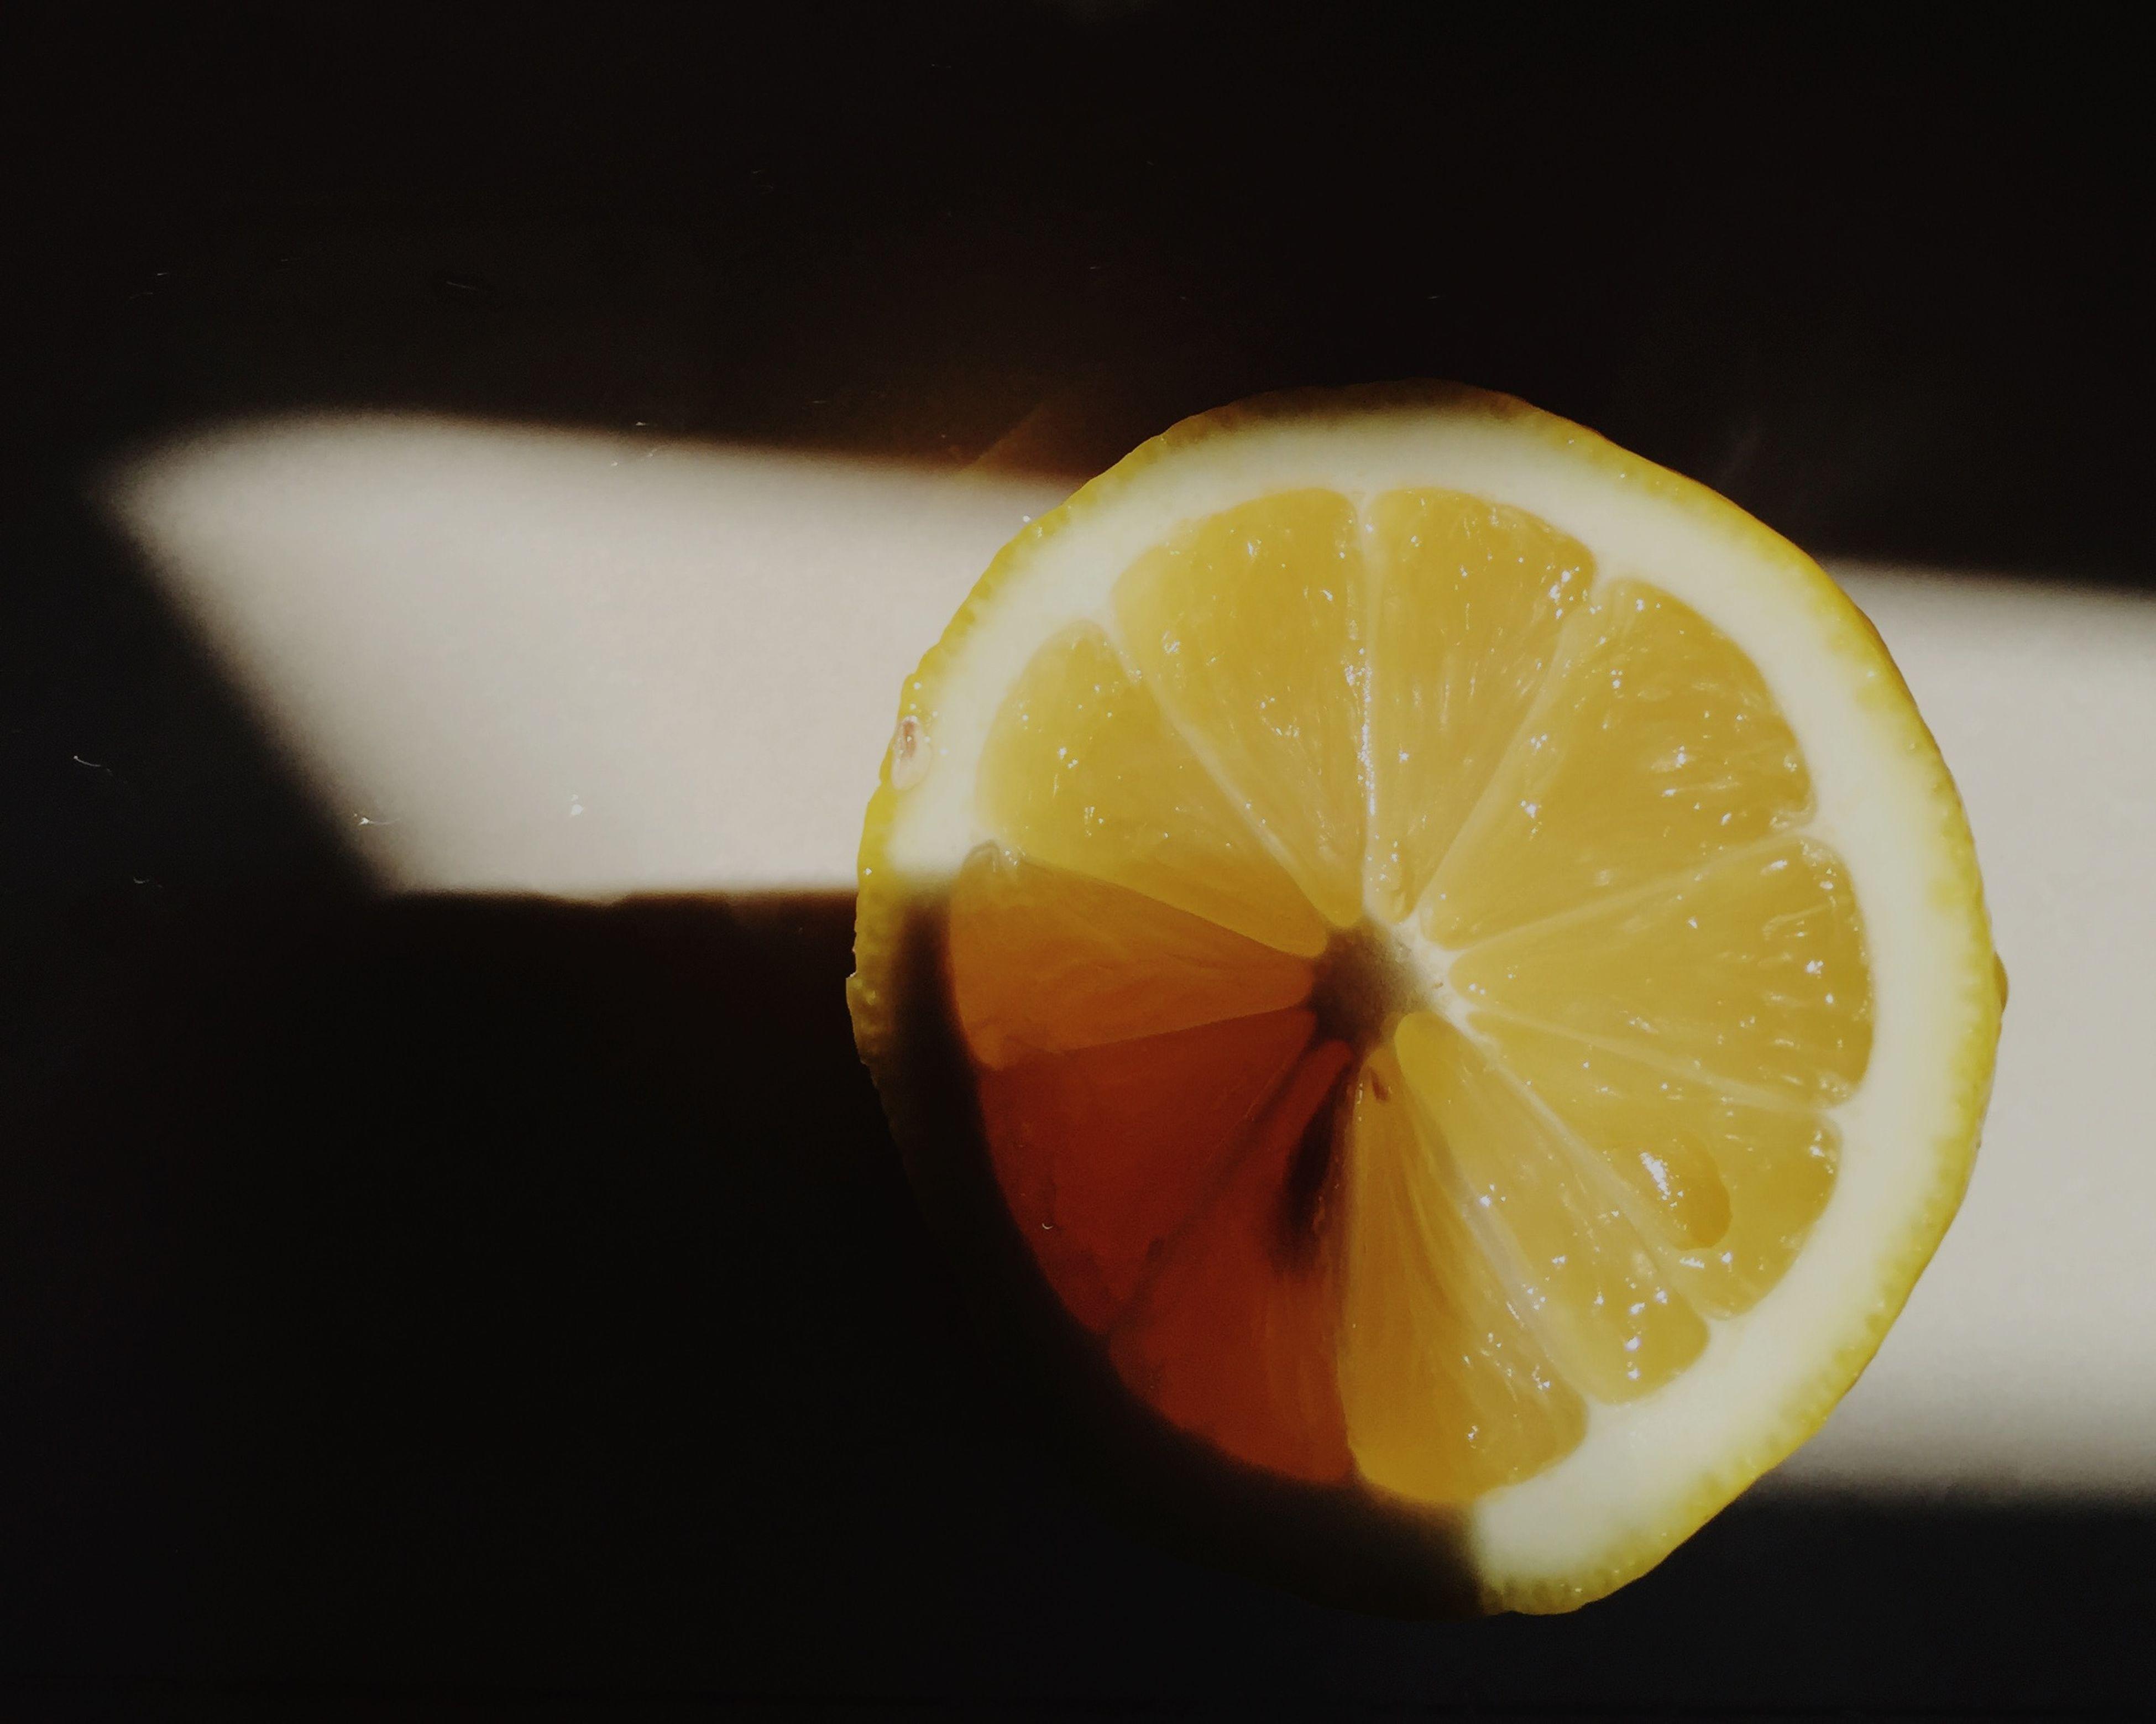 freshness, yellow, food and drink, fruit, close-up, food, healthy eating, indoors, still life, slice, studio shot, citrus fruit, orange - fruit, cross section, lemon, table, no people, orange color, halved, high angle view